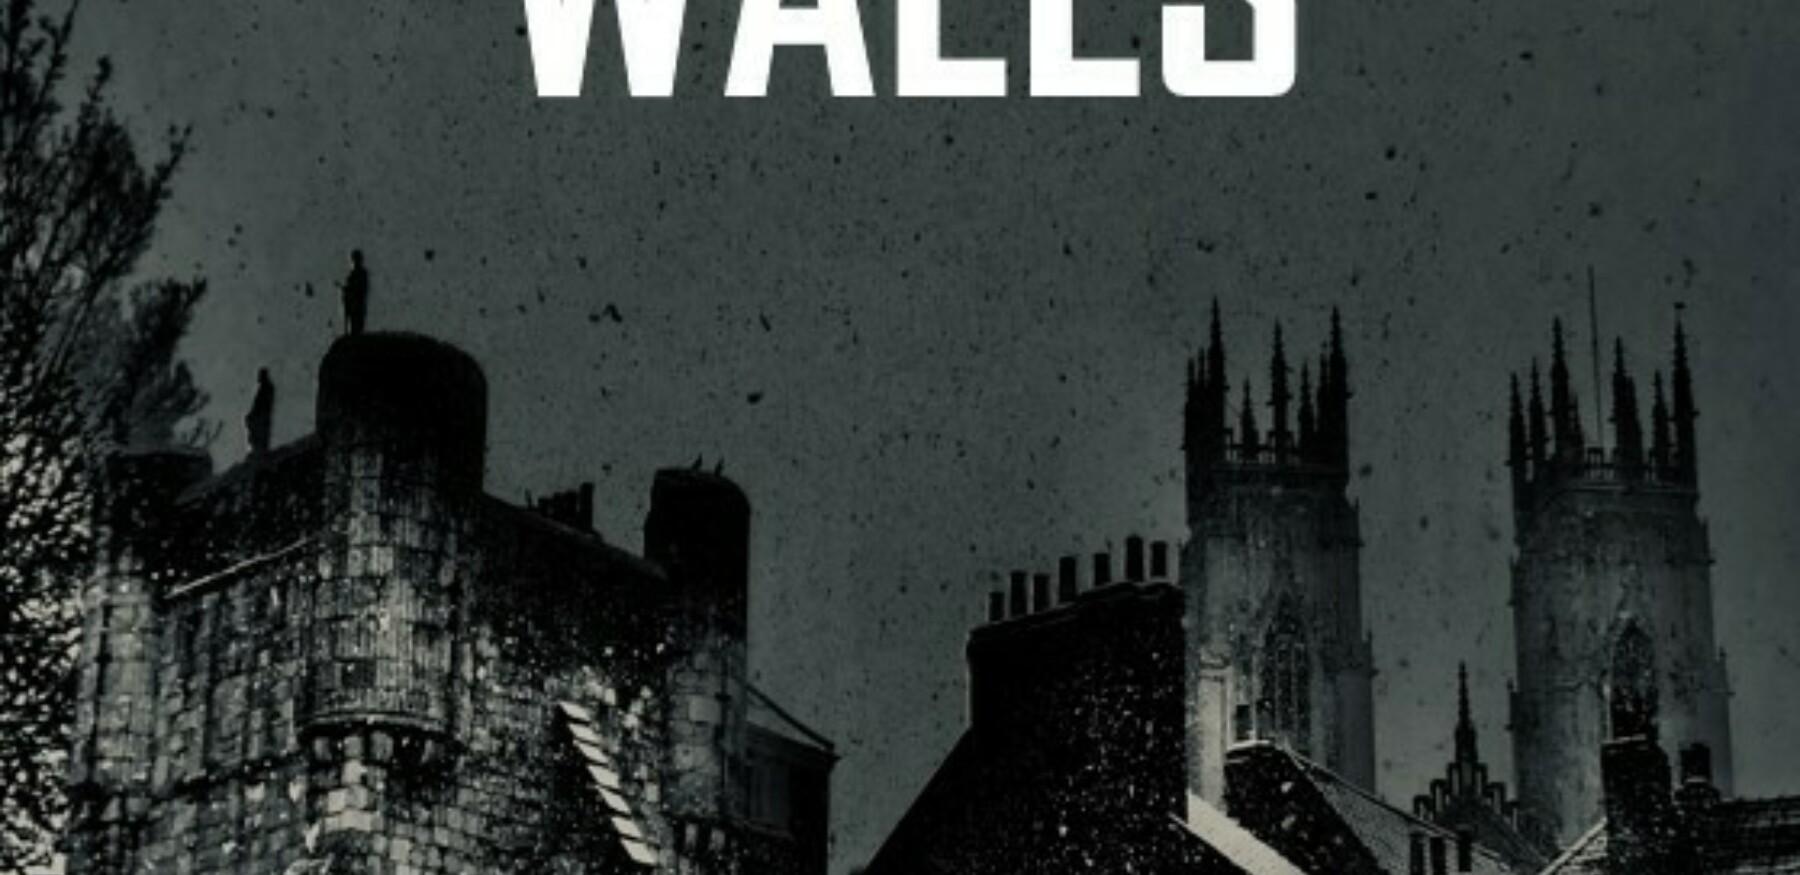 Twilight Walls Poster Portrait Less Text